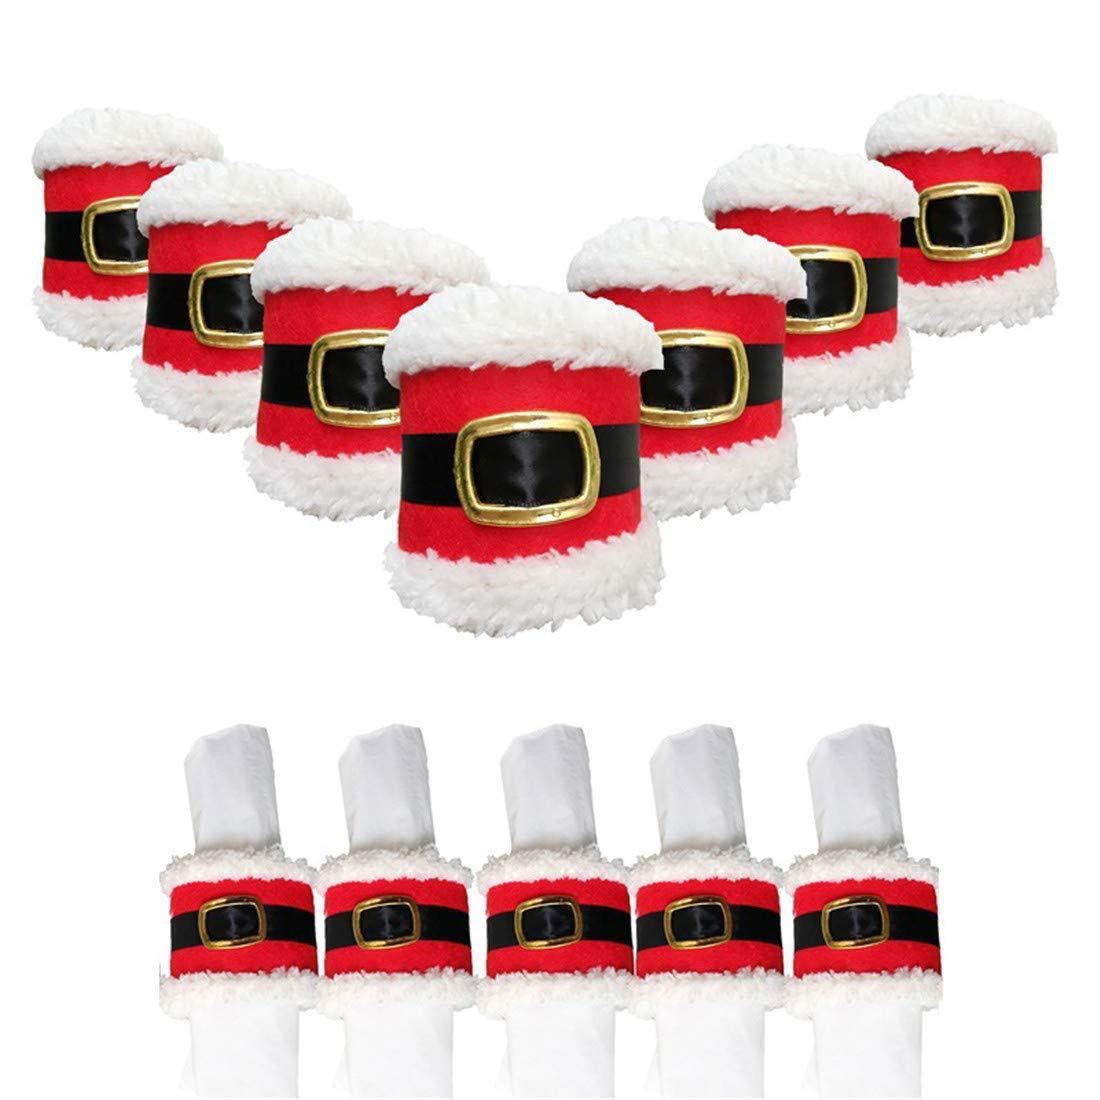 Deisy Dee 12pcs Christmas Santa Claus Belt Napkin Rings Serviette Holder Party Banquet Dinner Table Decor (style 1)